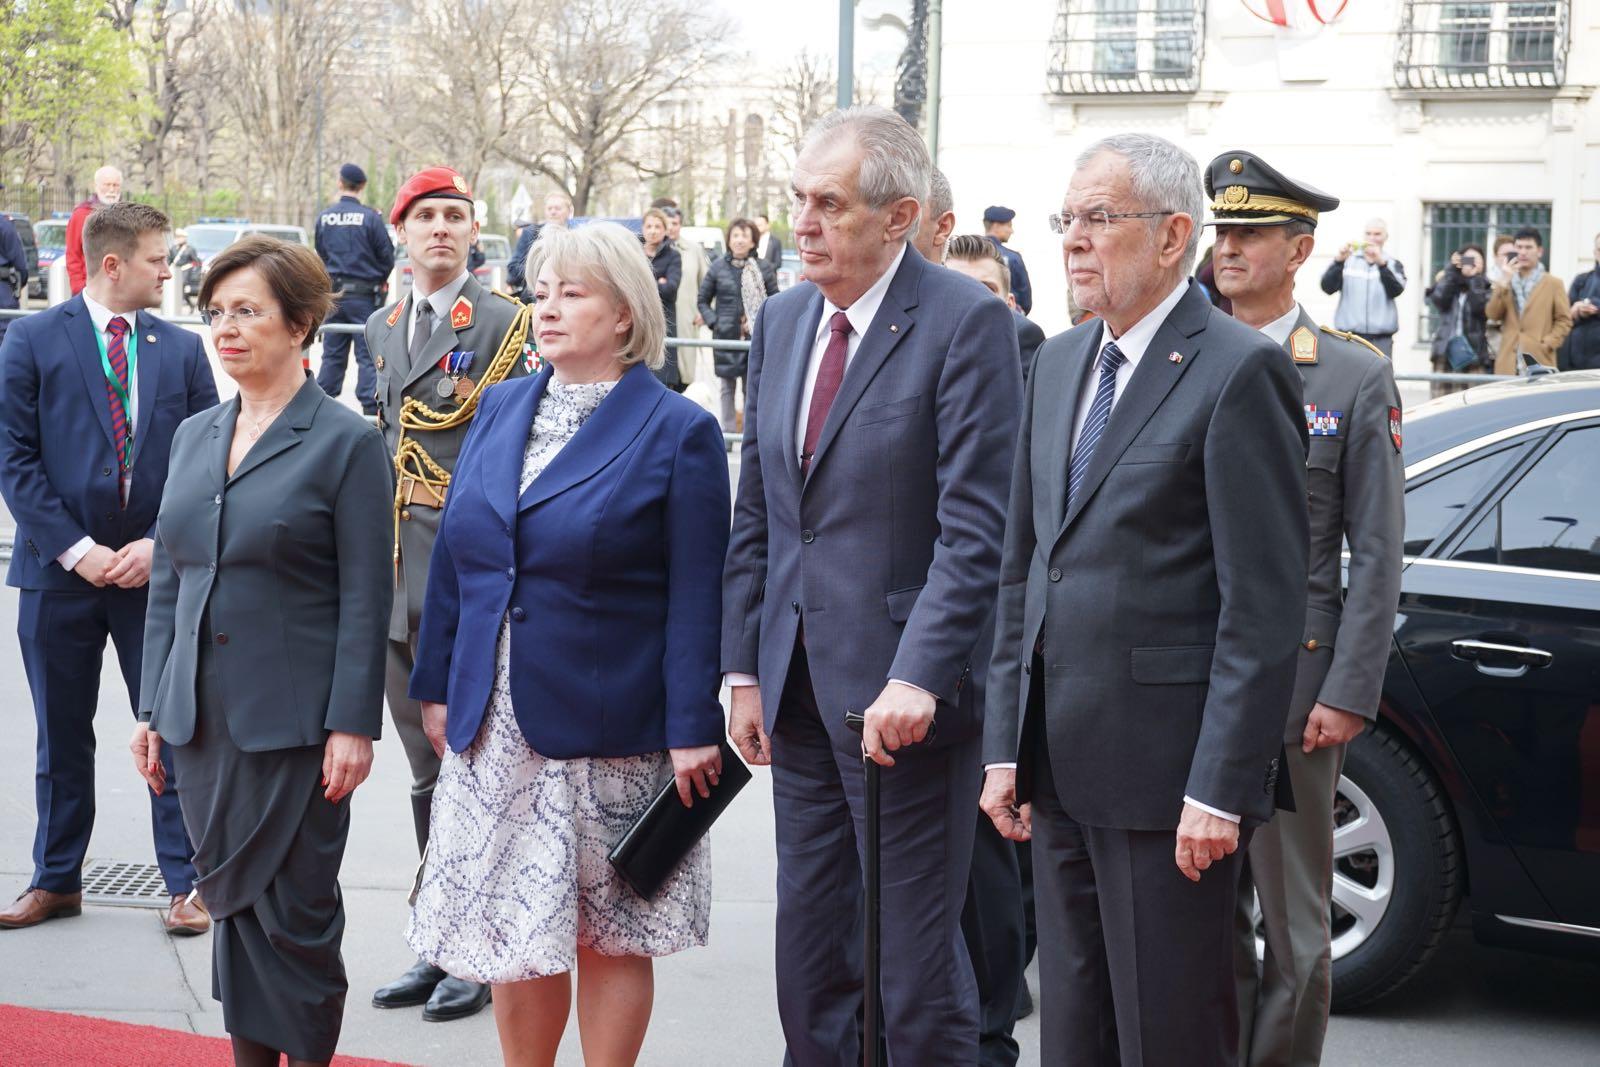 2019_04_03_4Gardekompanie_Tschechien_VdB - 31 of 46